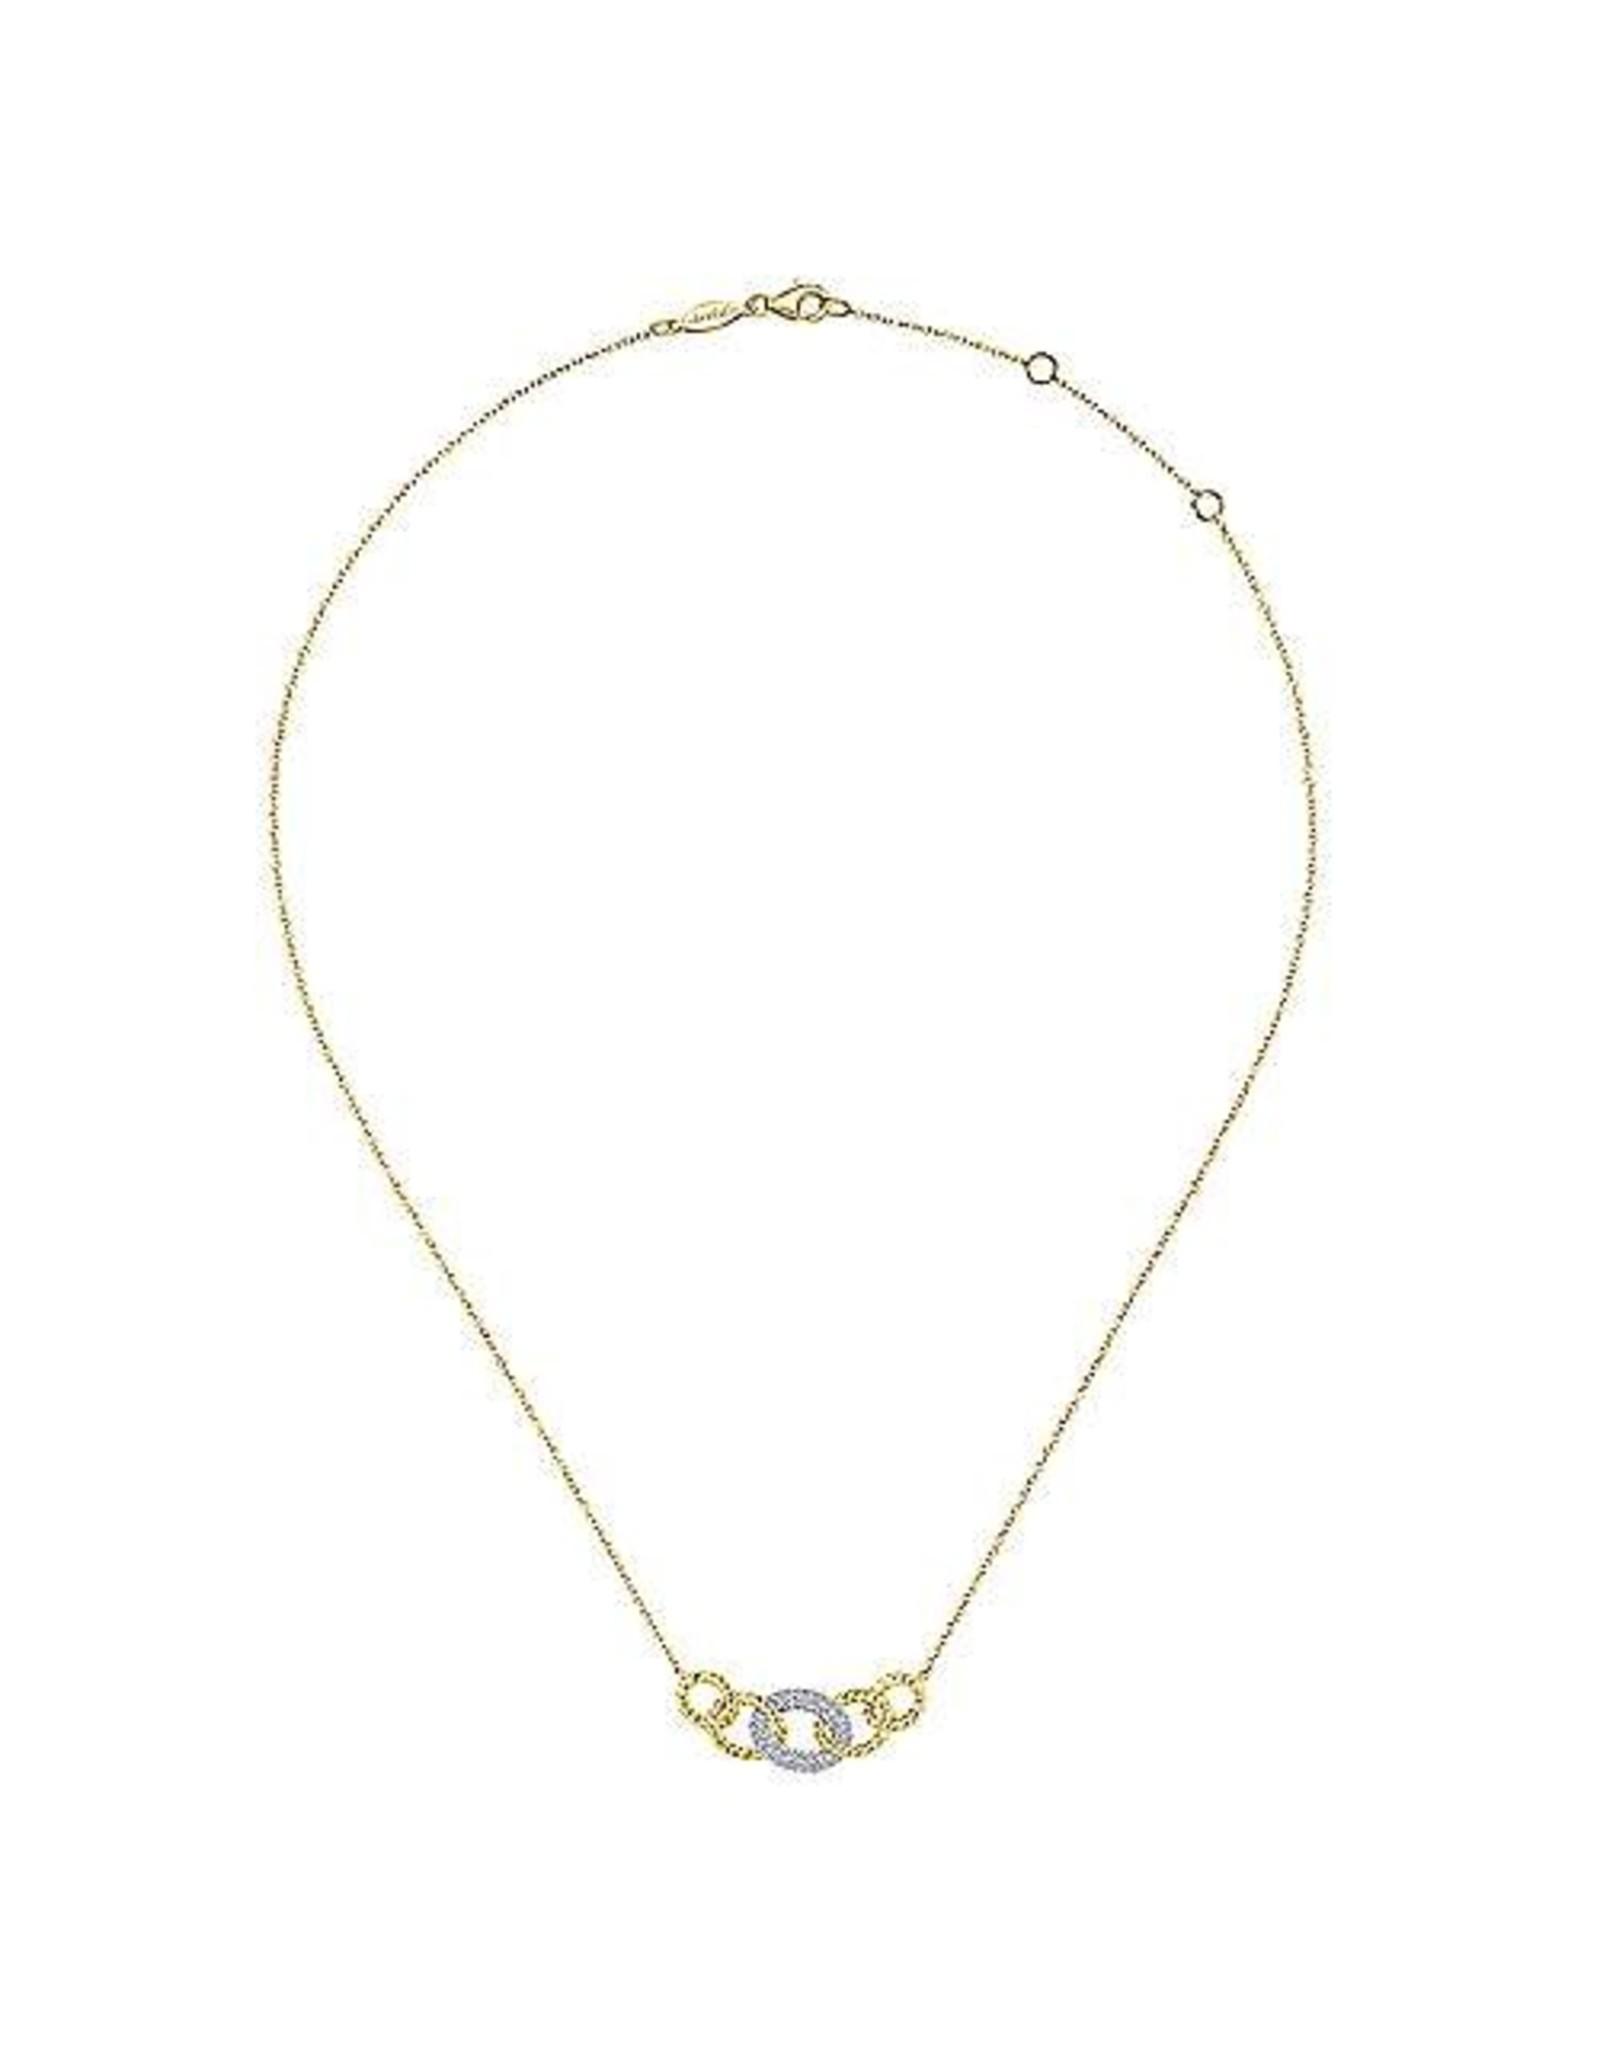 14K 2-tone Diamond Miami Link Chain Necklace, D: 0.21ct